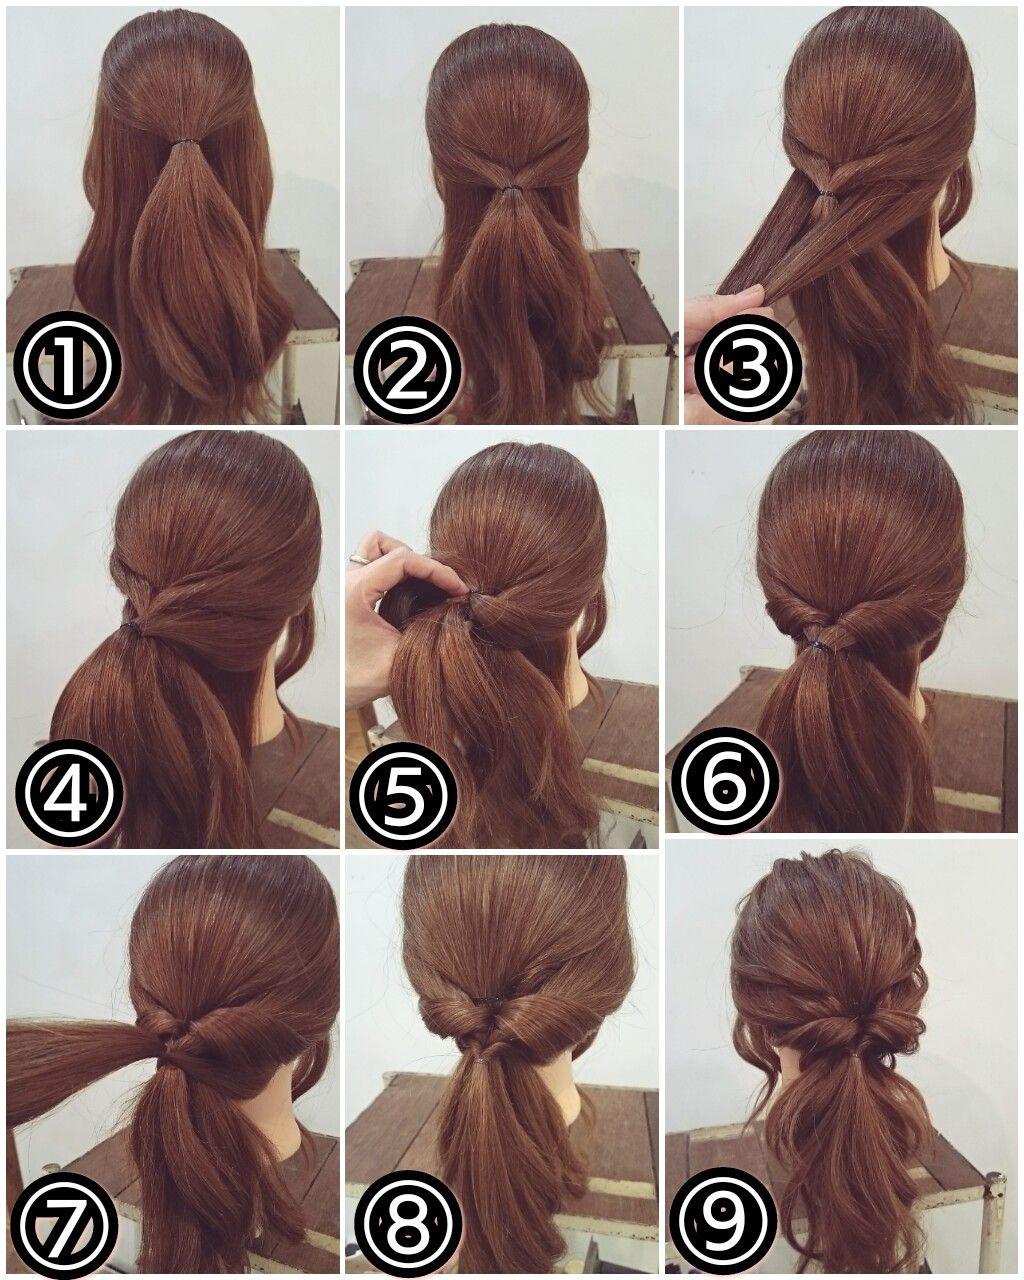 Pin by nayab lakadia on hairstyles pinterest hair style easy